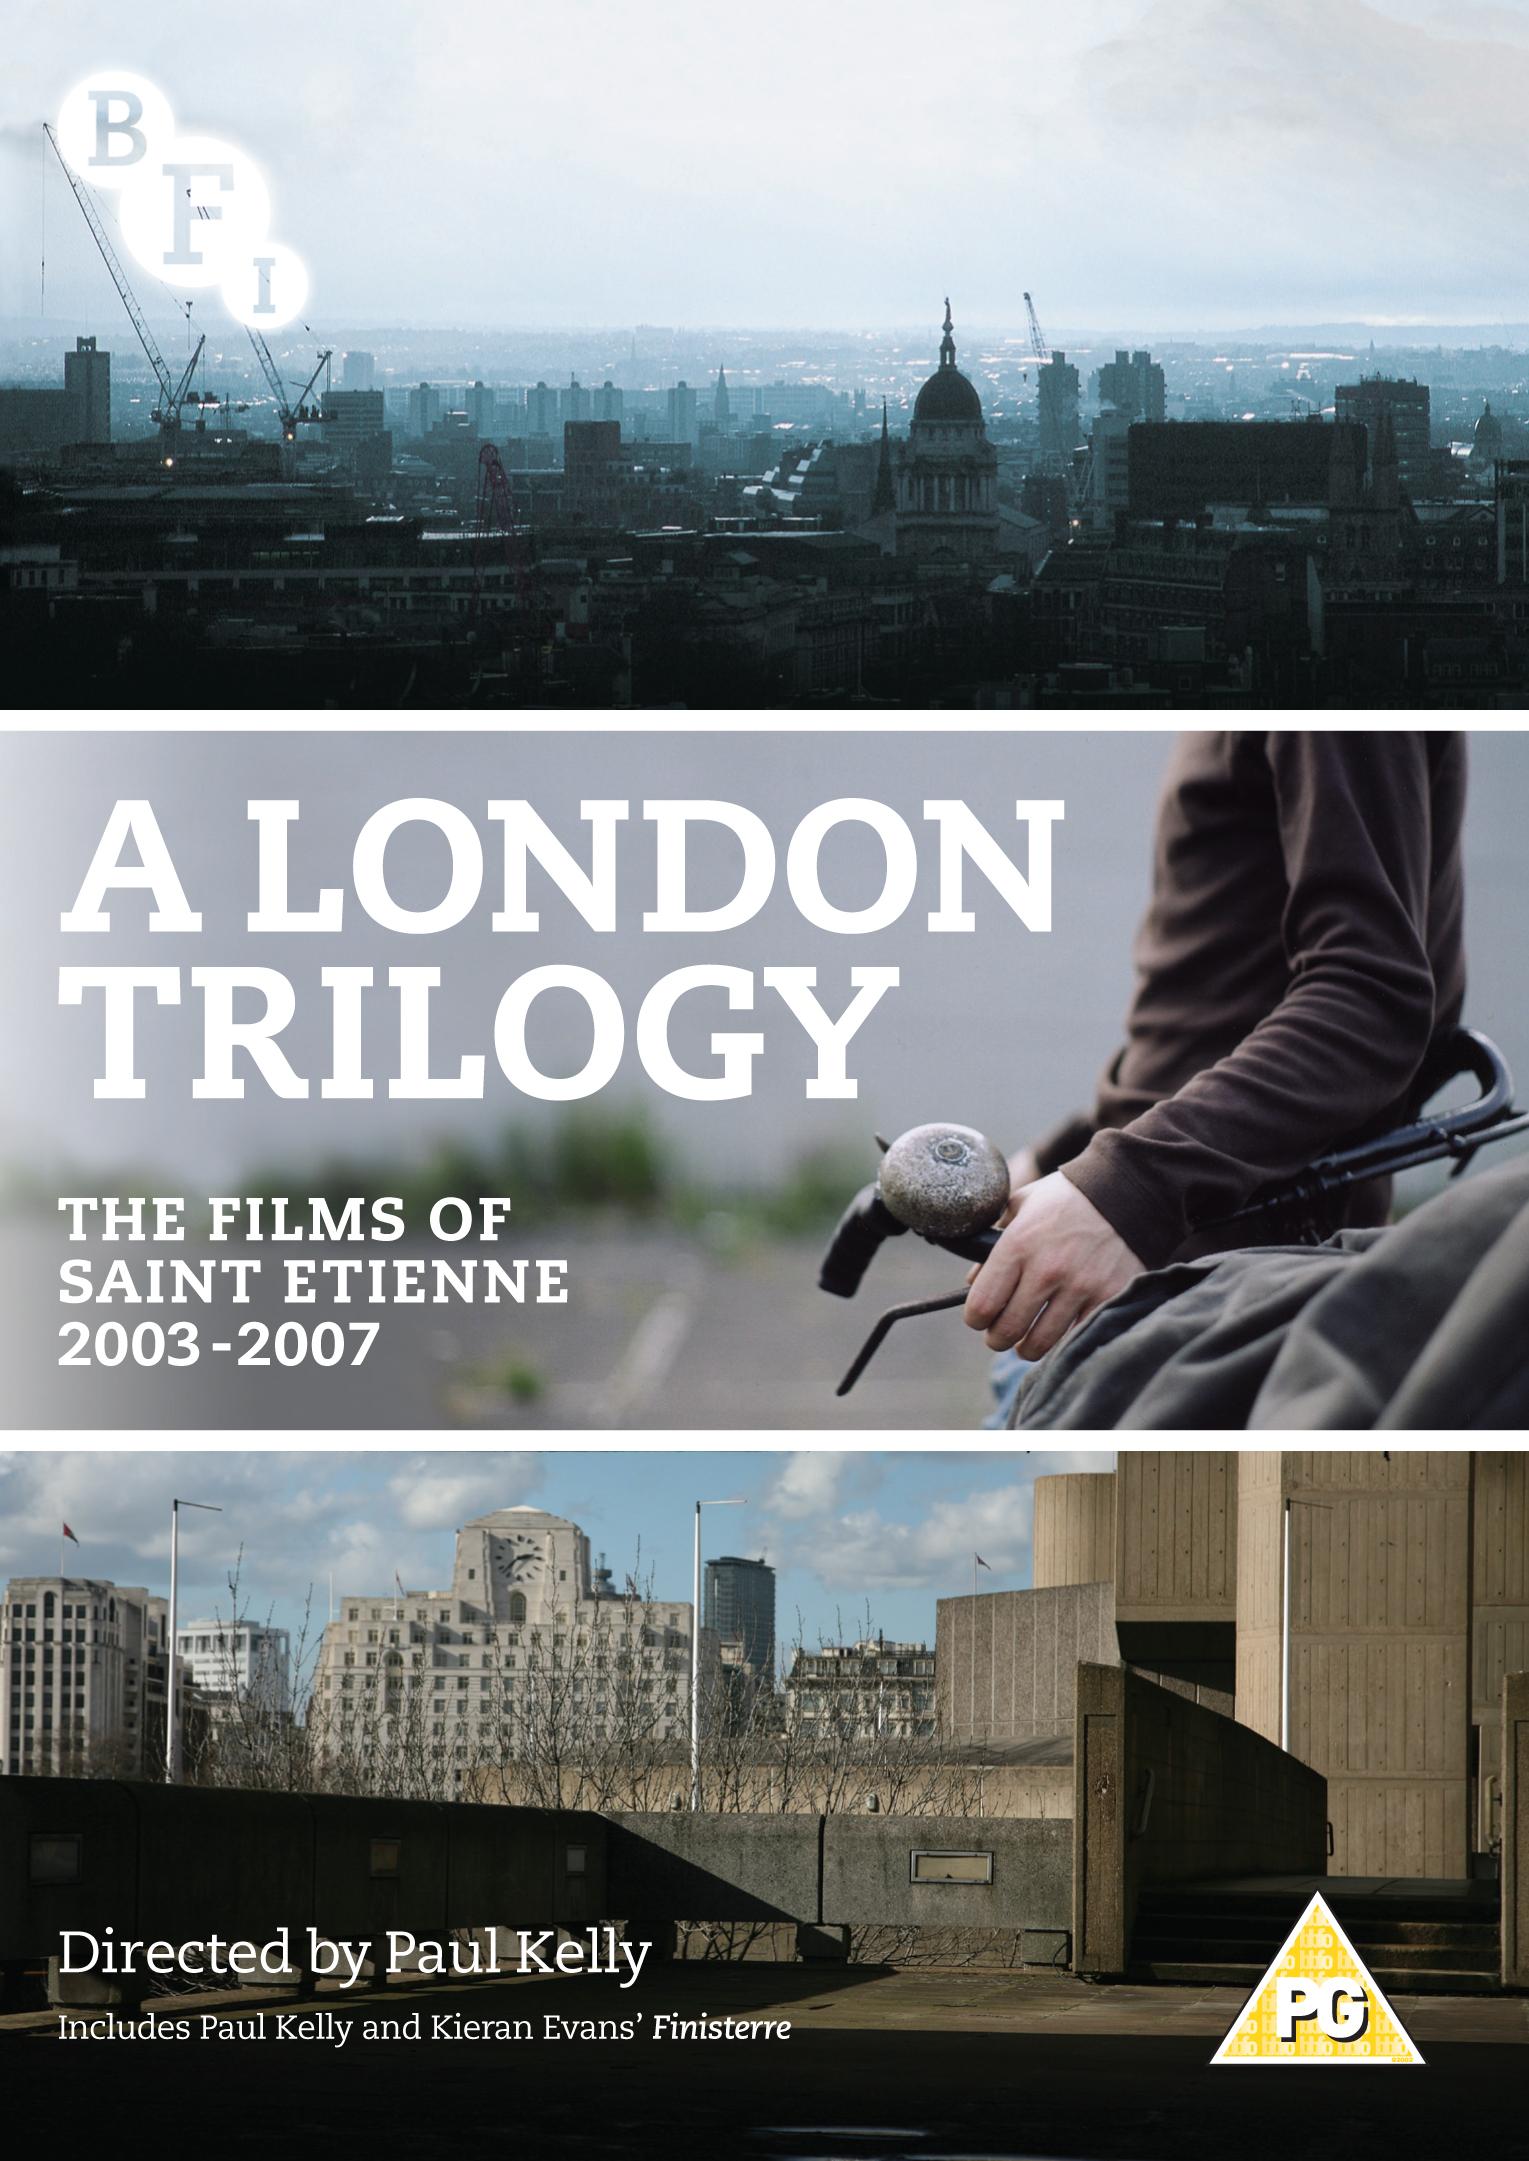 Buy London Trilogy - The Films of Saint Etienne, A  (DVD)